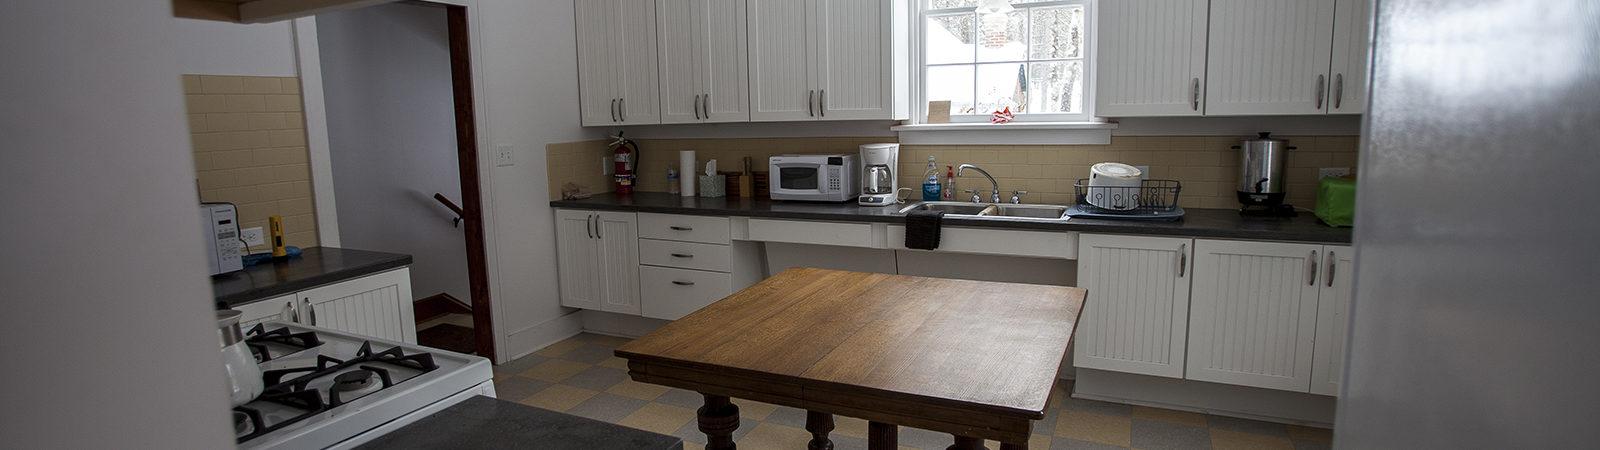 Forest Lodge Gatehouse Kitchen